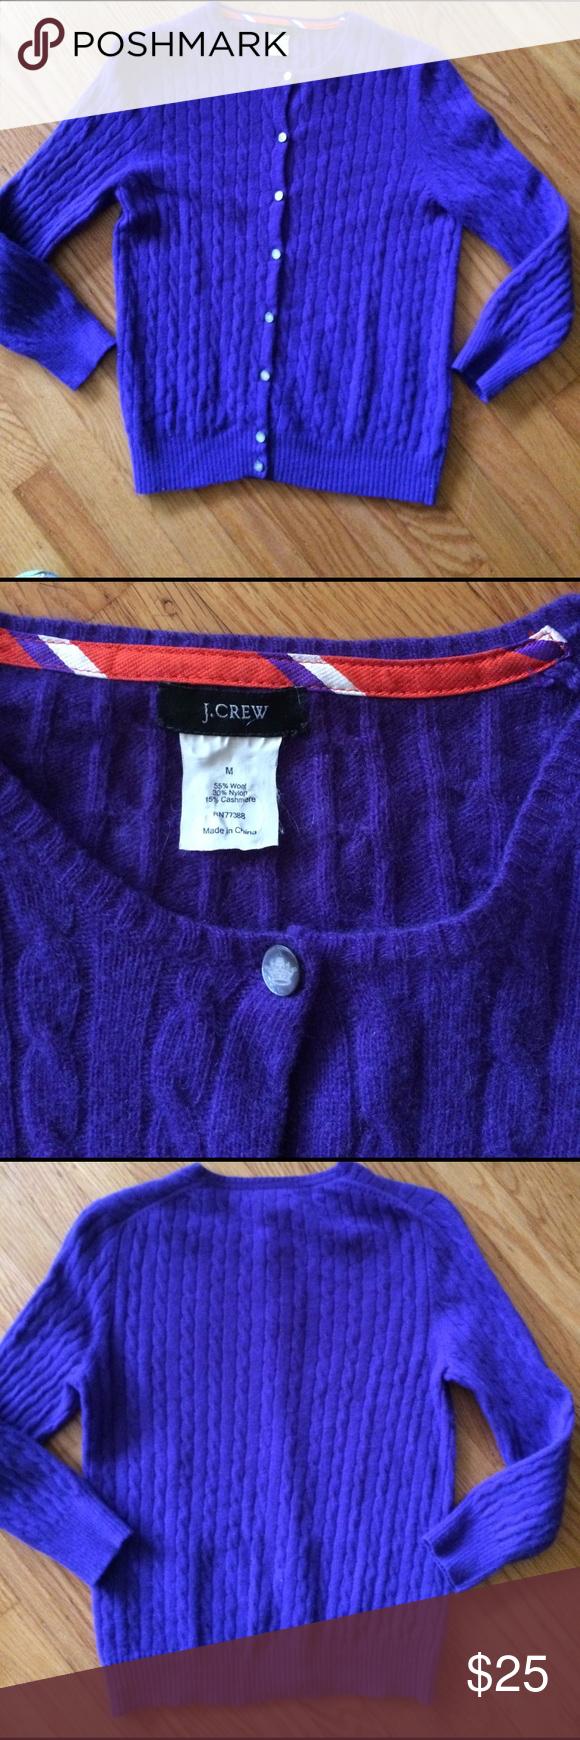 Turtleneck Sweater Old Navy